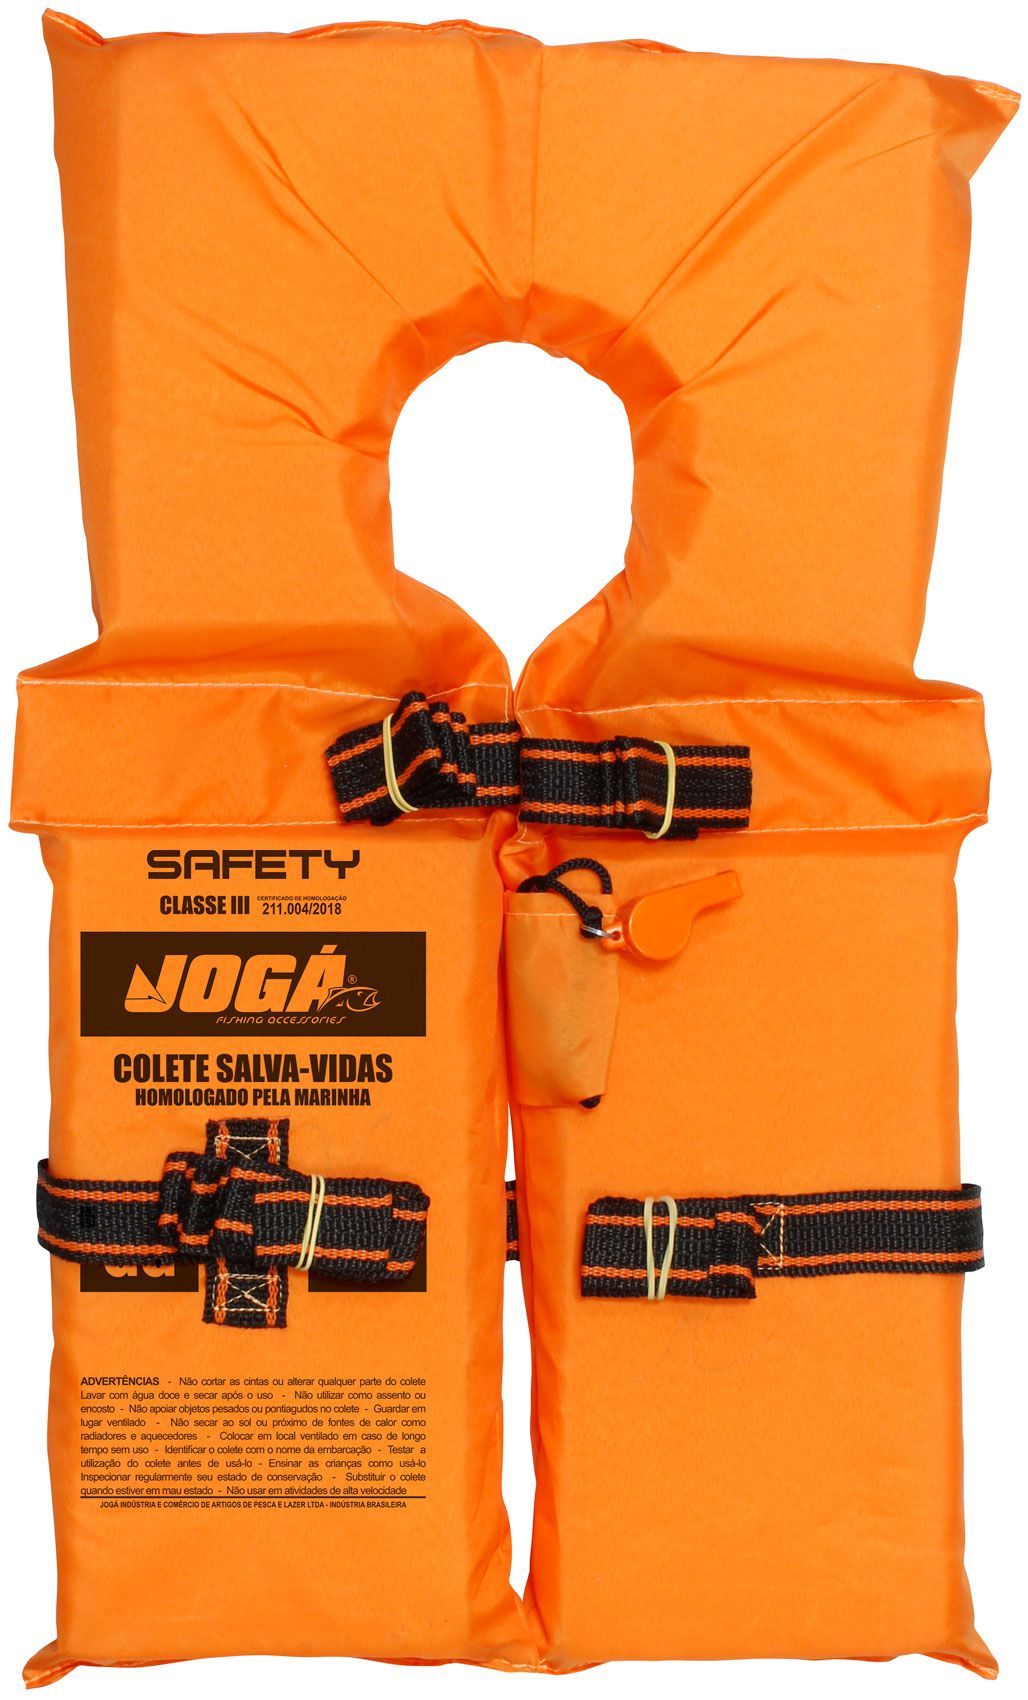 Colete Salva Vidas Jogá Classe 3 Safety Laranja - M